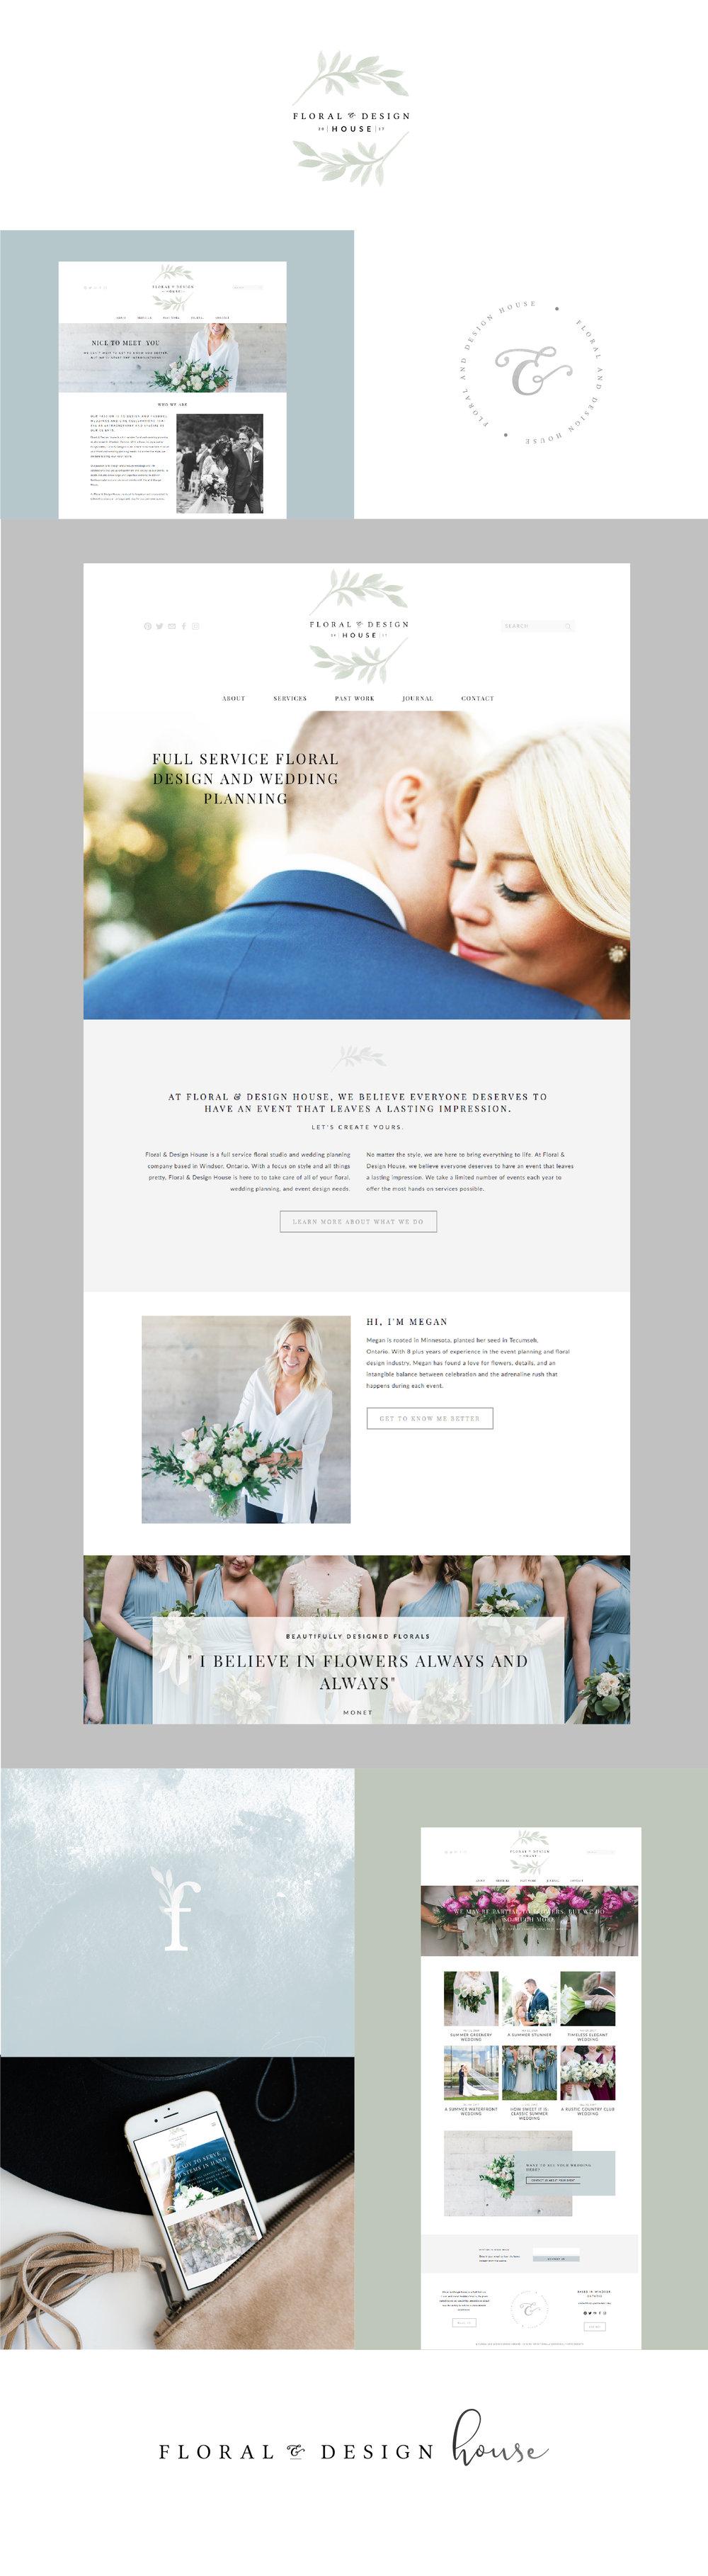 Floral & Design House Portfolio